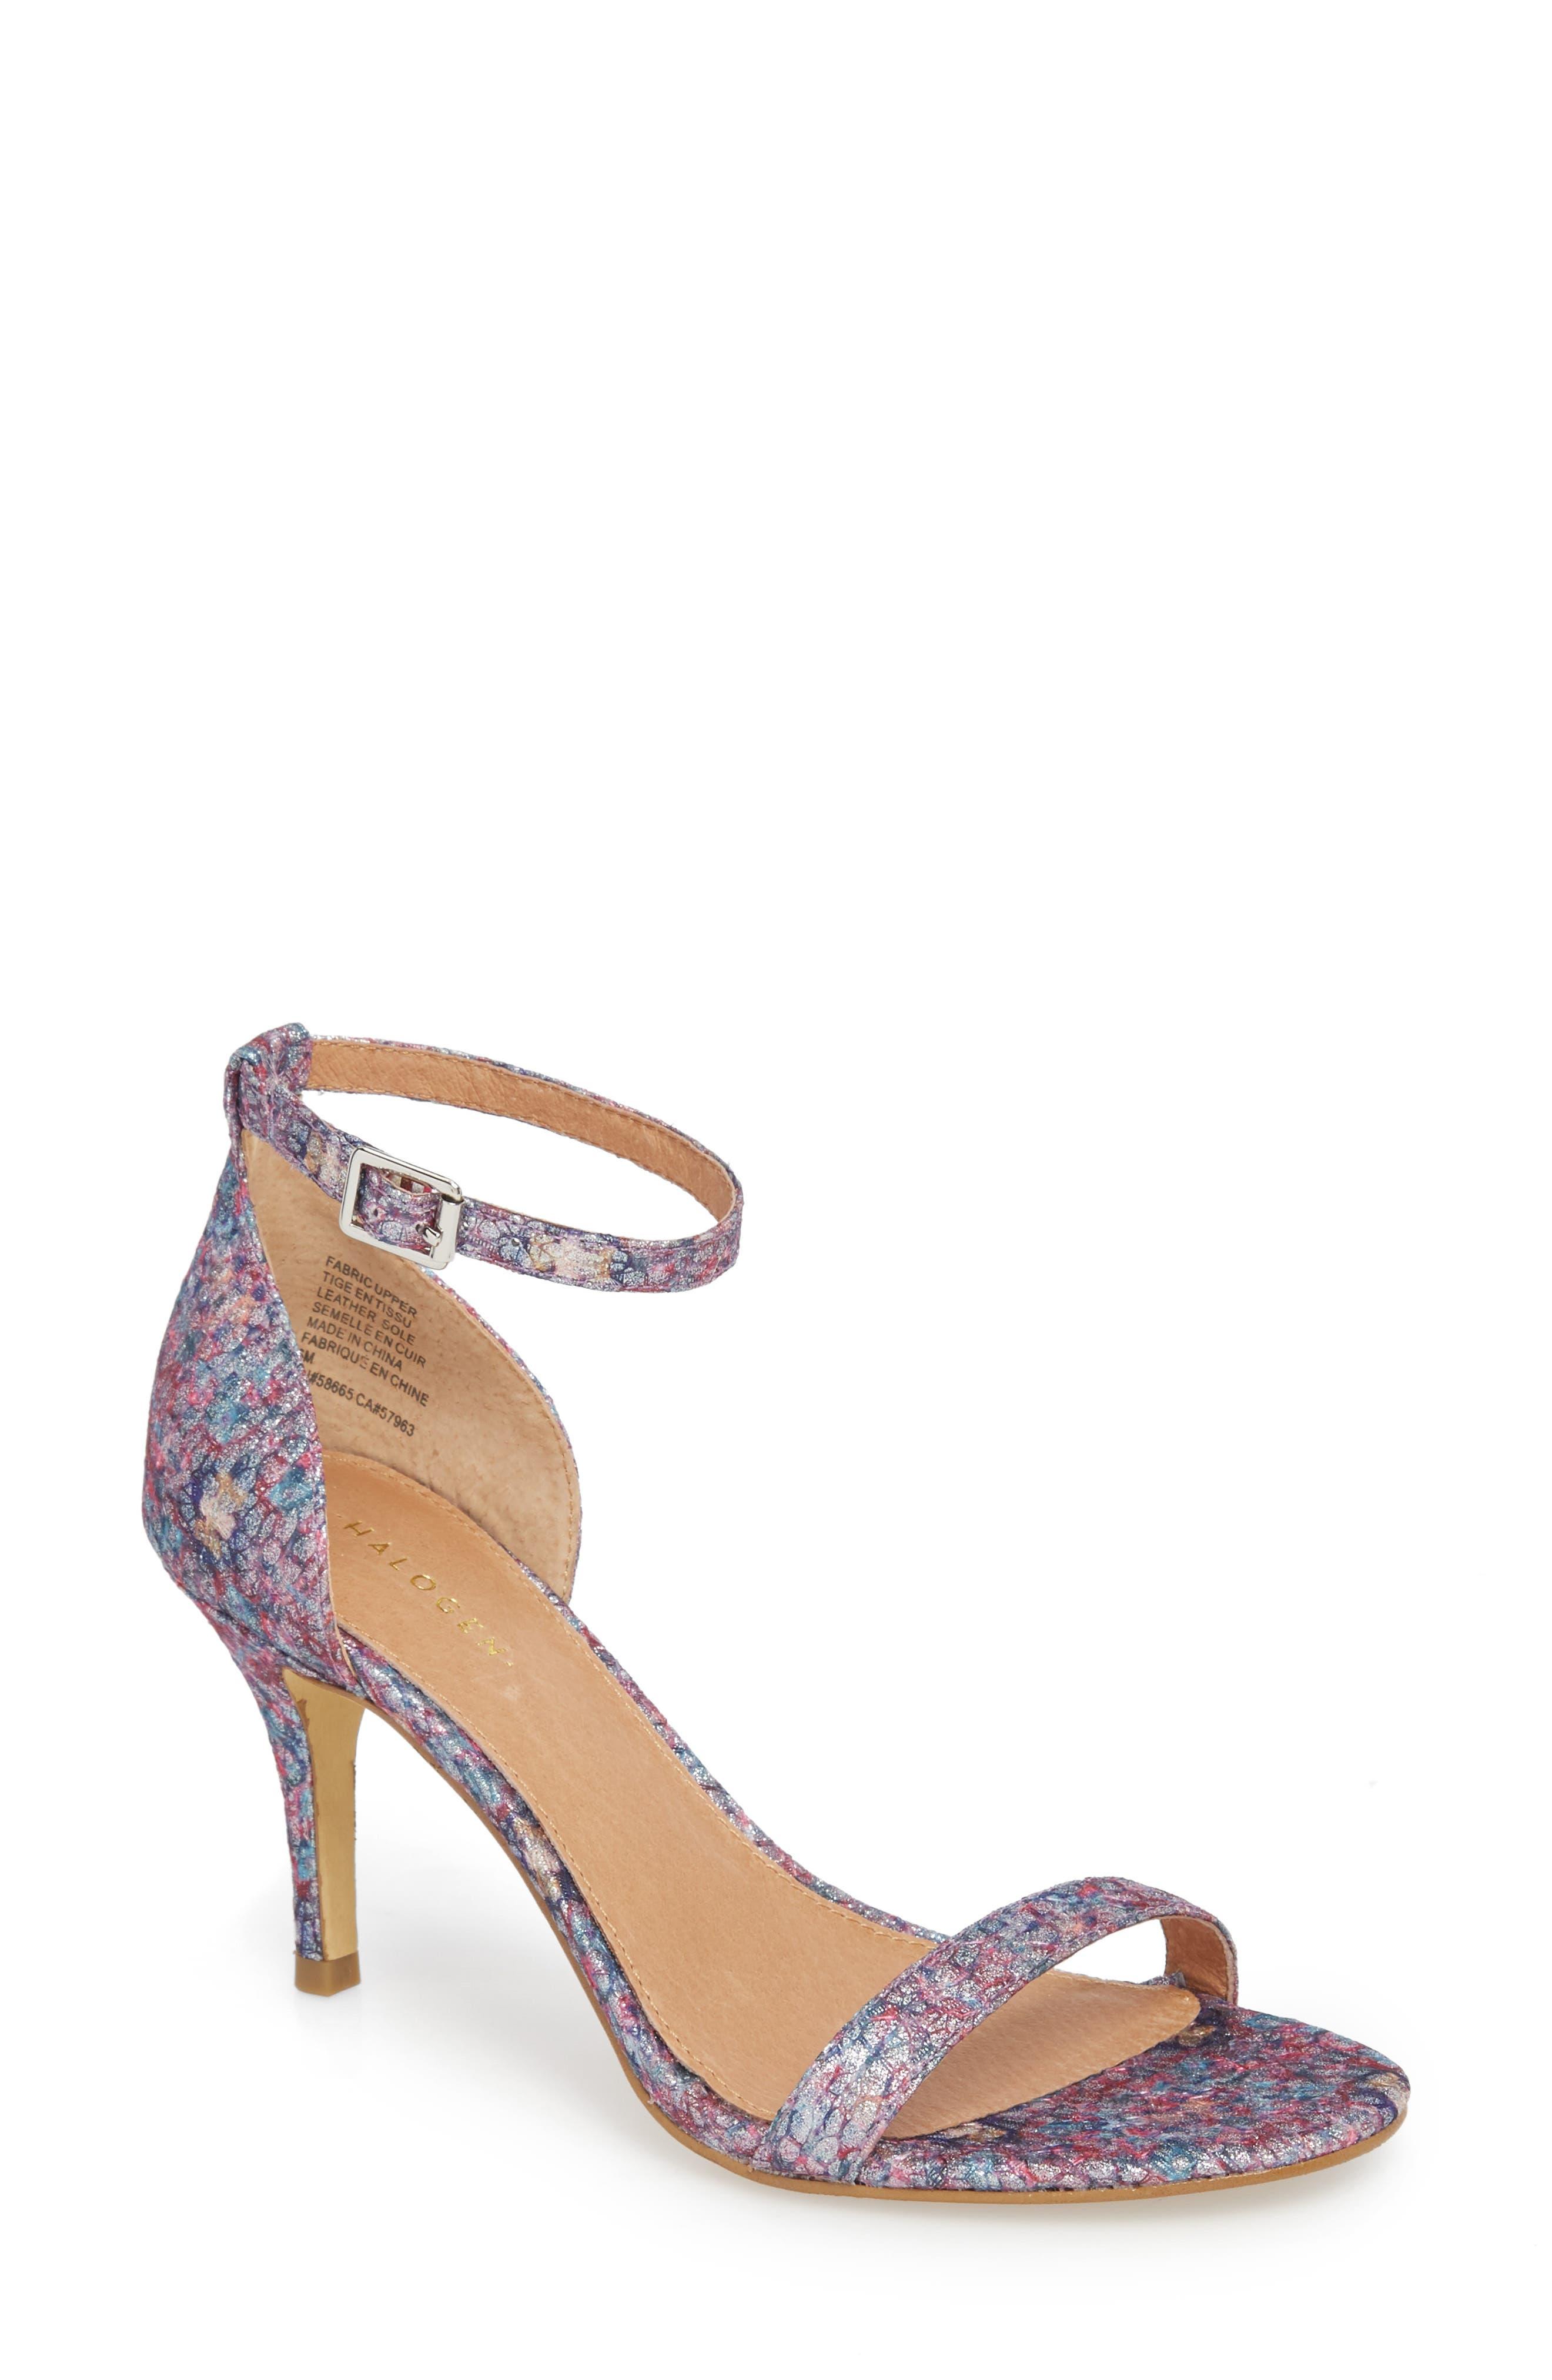 Audrey Ankle Strap Sandal,                         Main,                         color, Bright Confetti Fabric